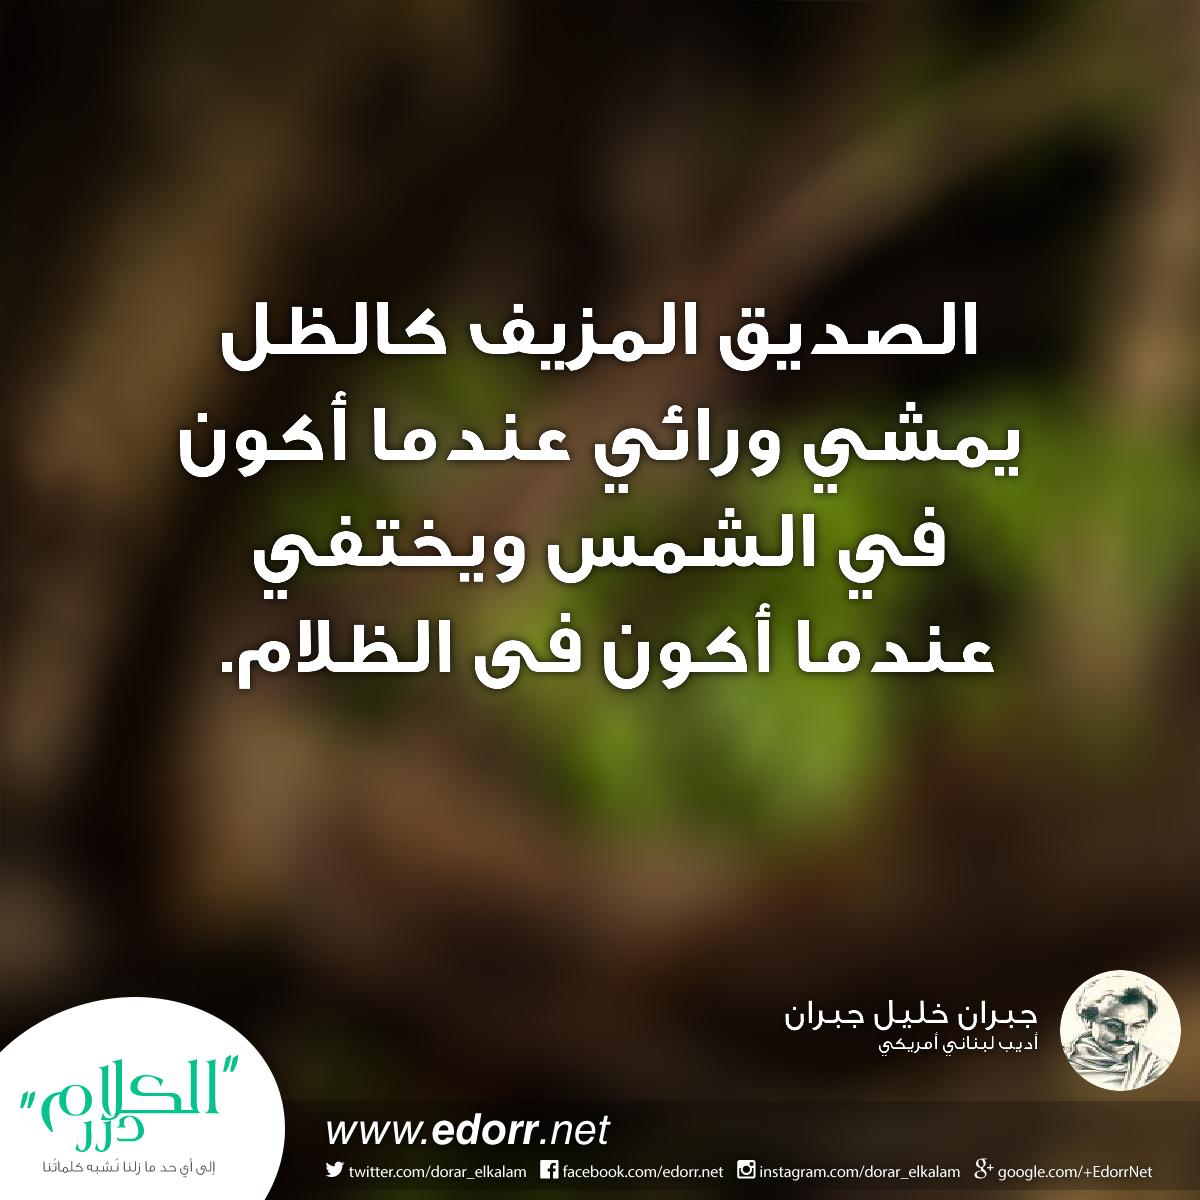 صديق كثير الغدر ليس له رعاء Arabic Quotes Beautiful Arabic Words Ali Quotes